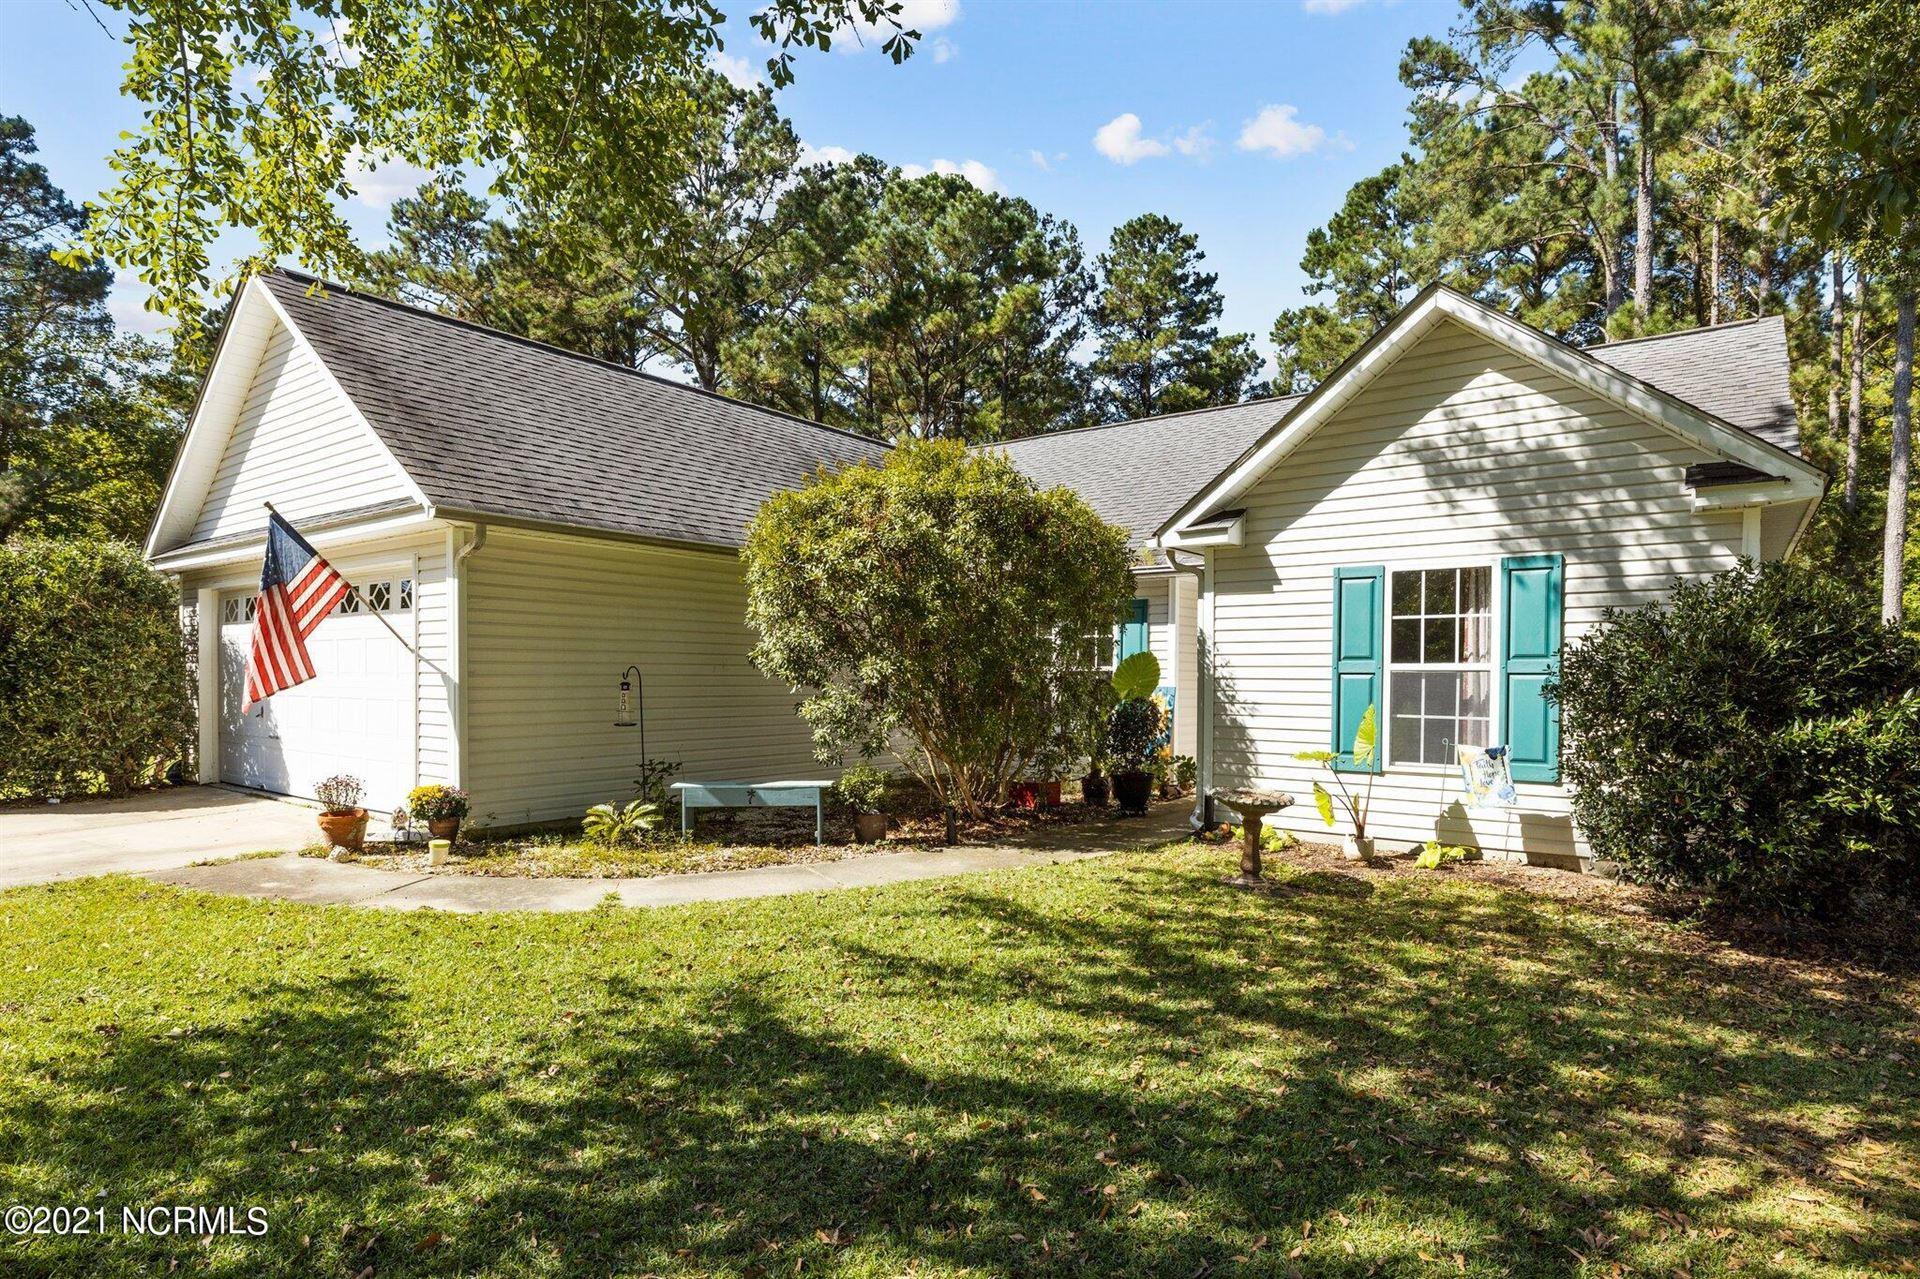 Photo of 239 Lemonwood Drive, Havelock, NC 28532 (MLS # 100292929)